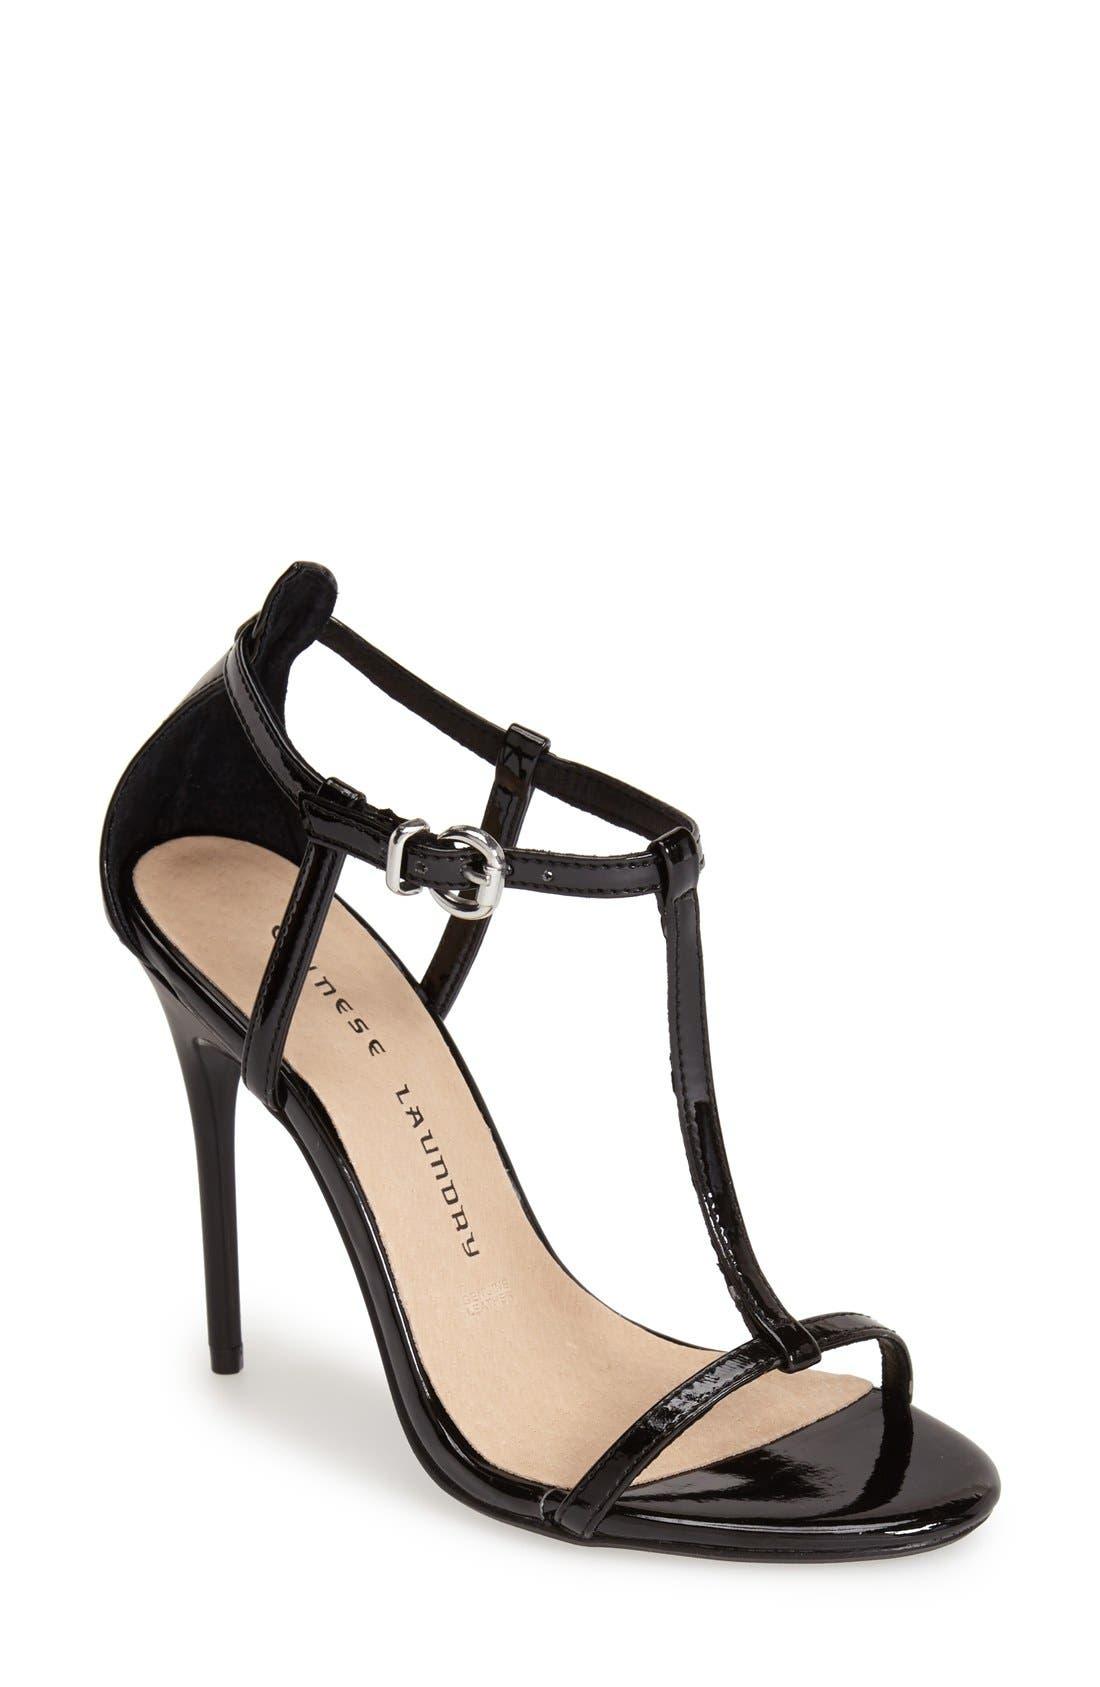 CHINESE LAUNDRY, 'Leo' Patent T-Strap Sandal, Main thumbnail 1, color, 001